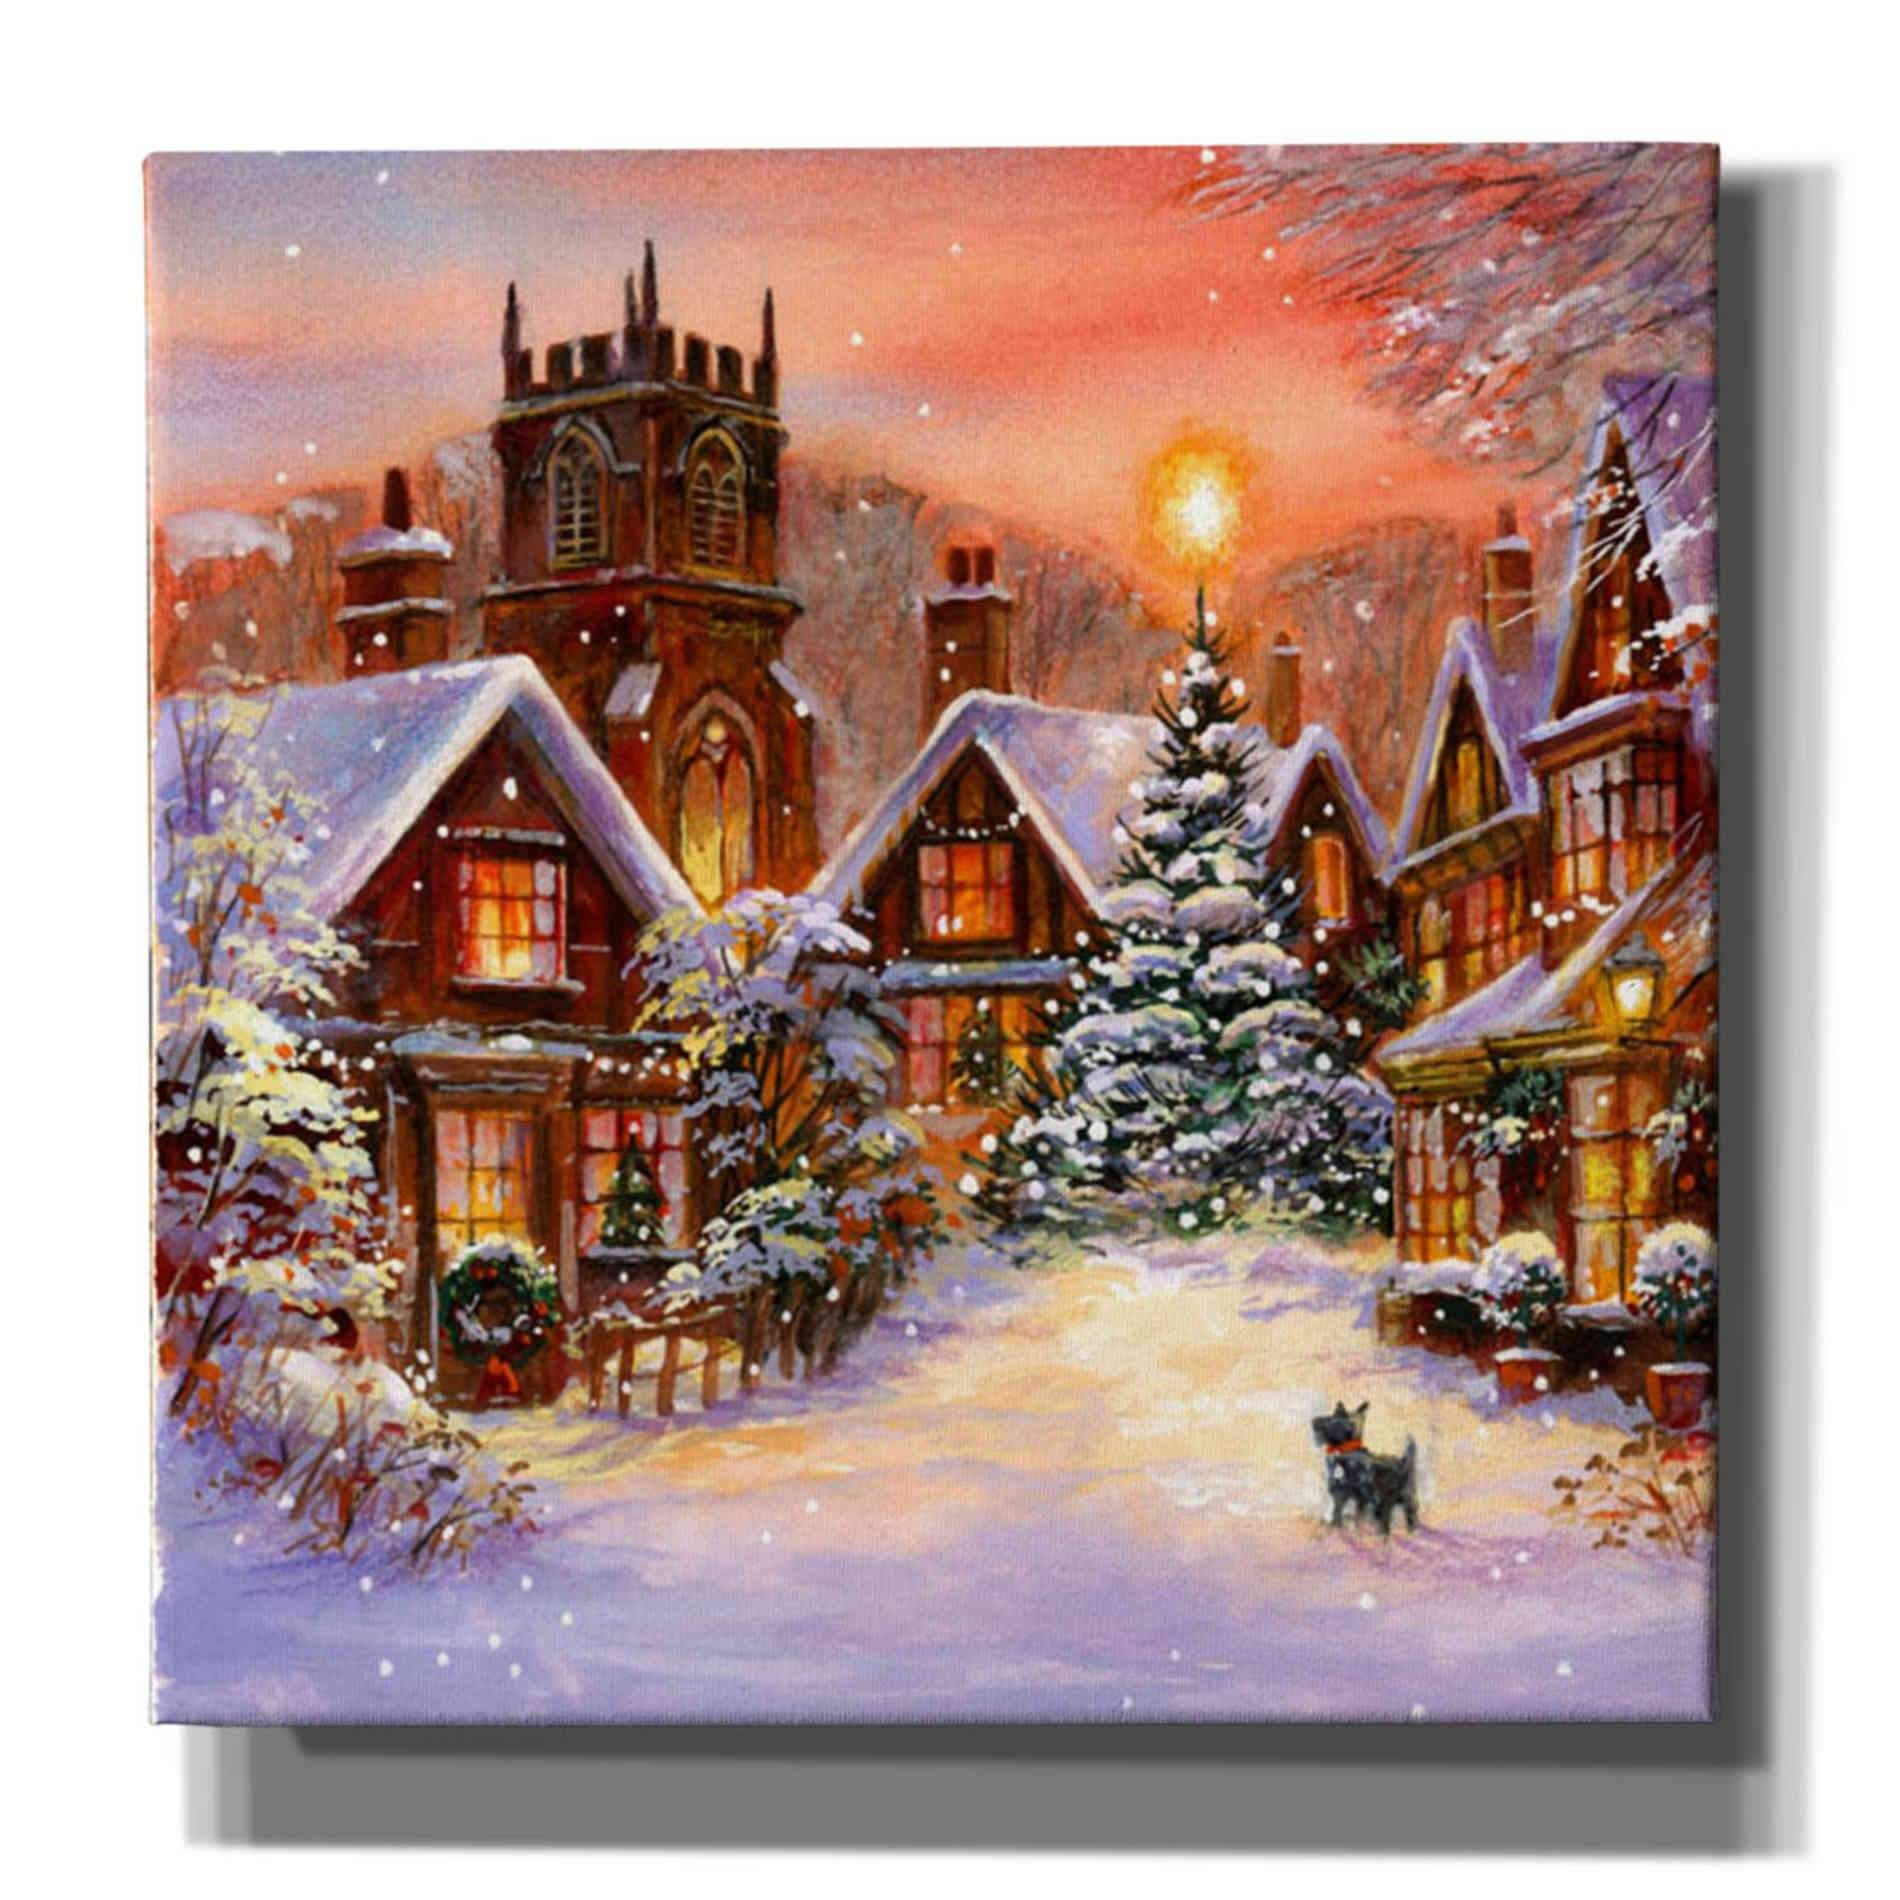 Christmas Town Ii By A V Art Canvas Wall Art In 2021 Canvas Art Prints Art Prints Art